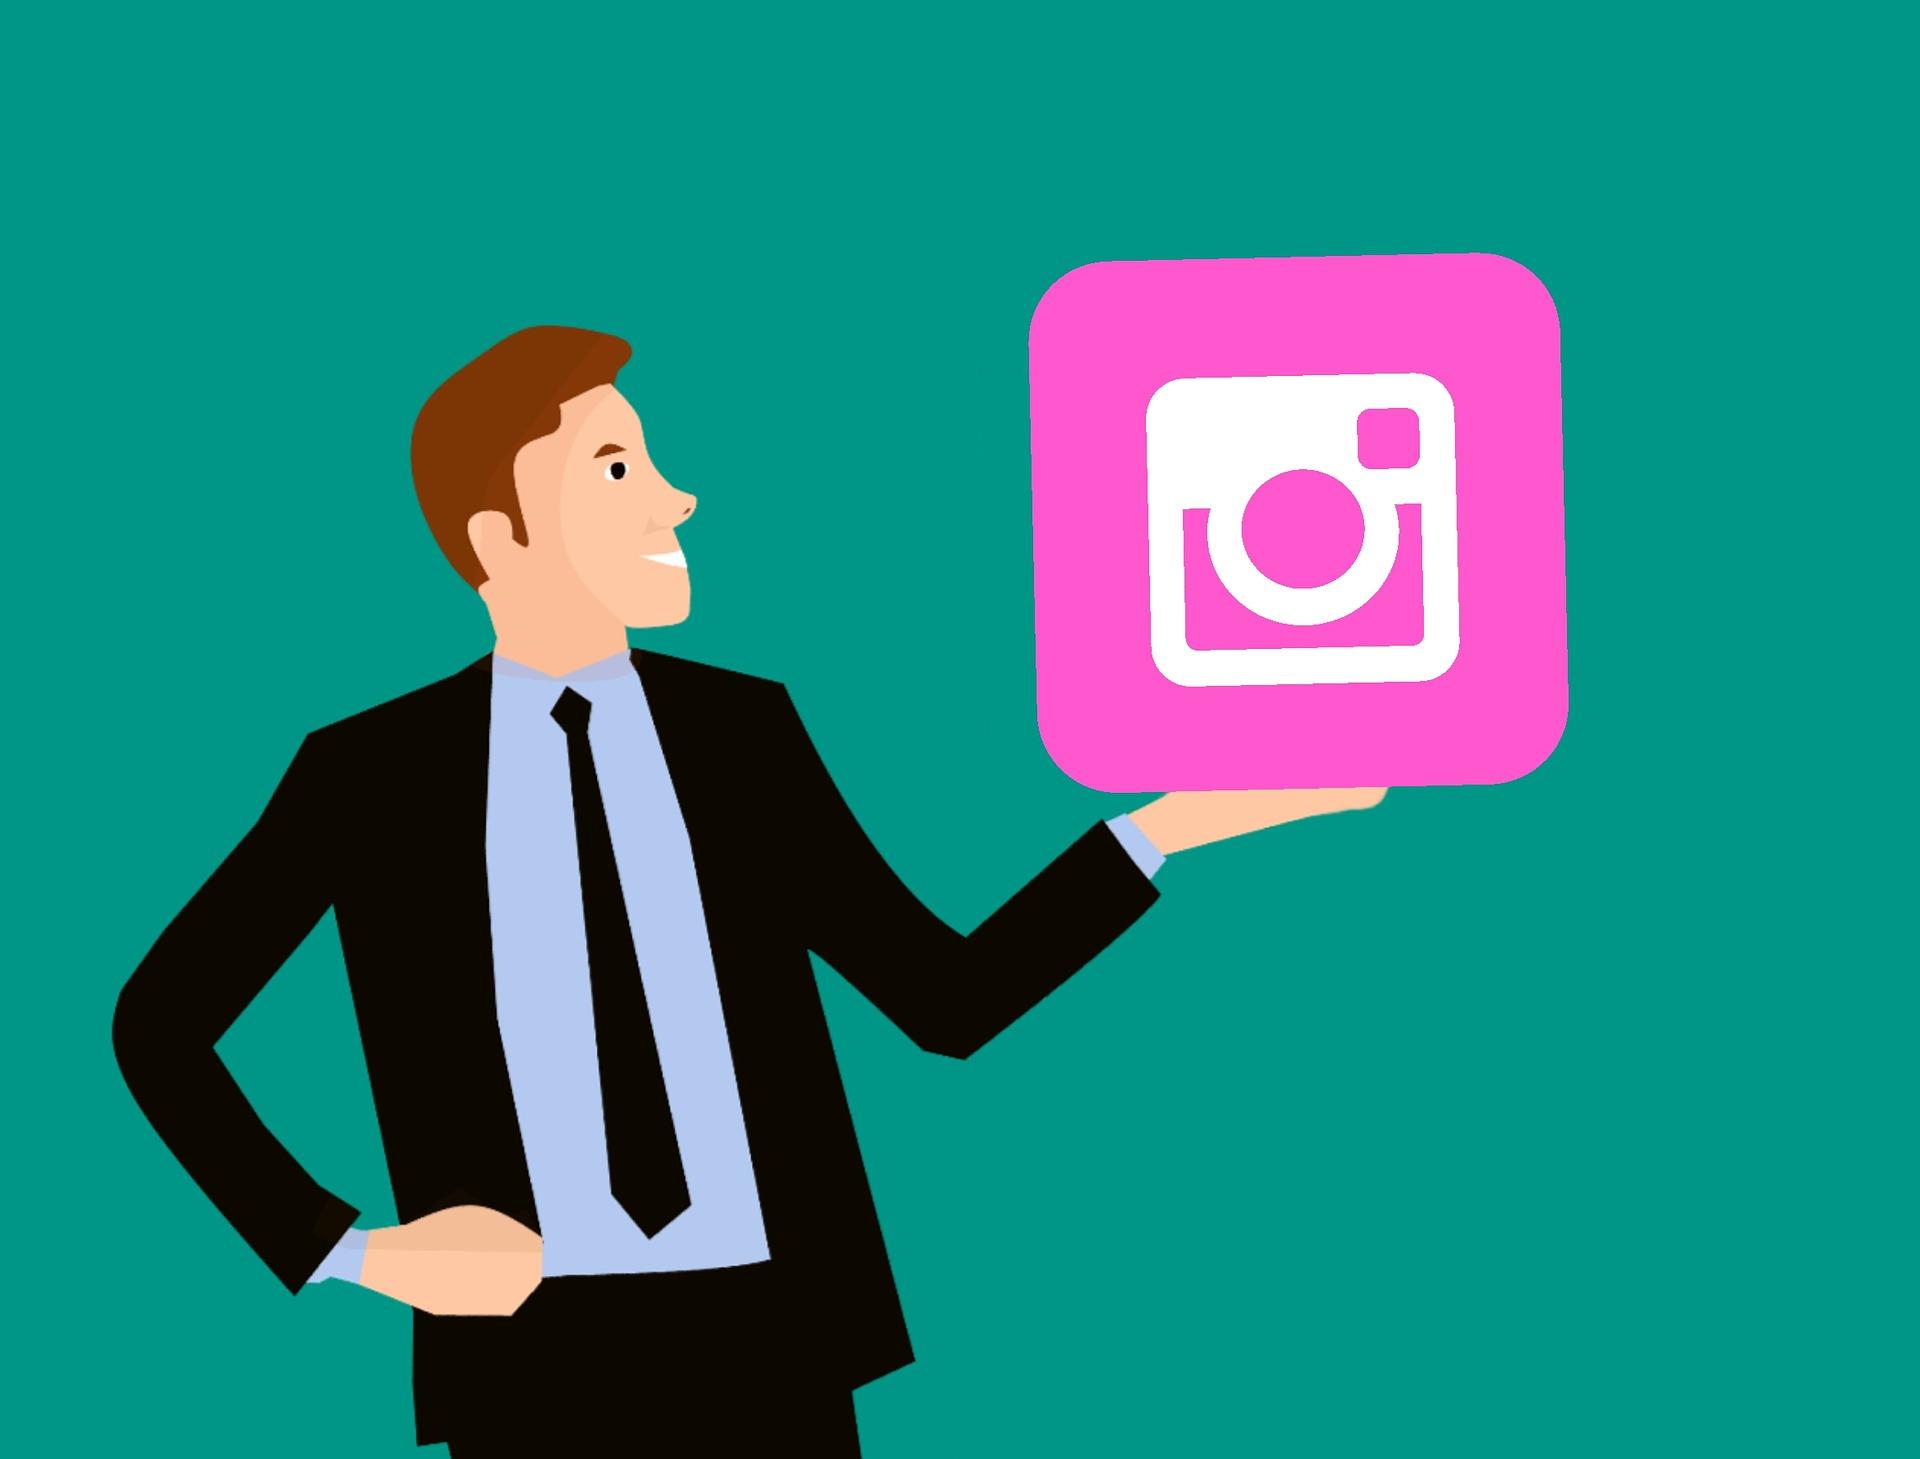 Successful fashion marketing strategy to create Instagram buzz